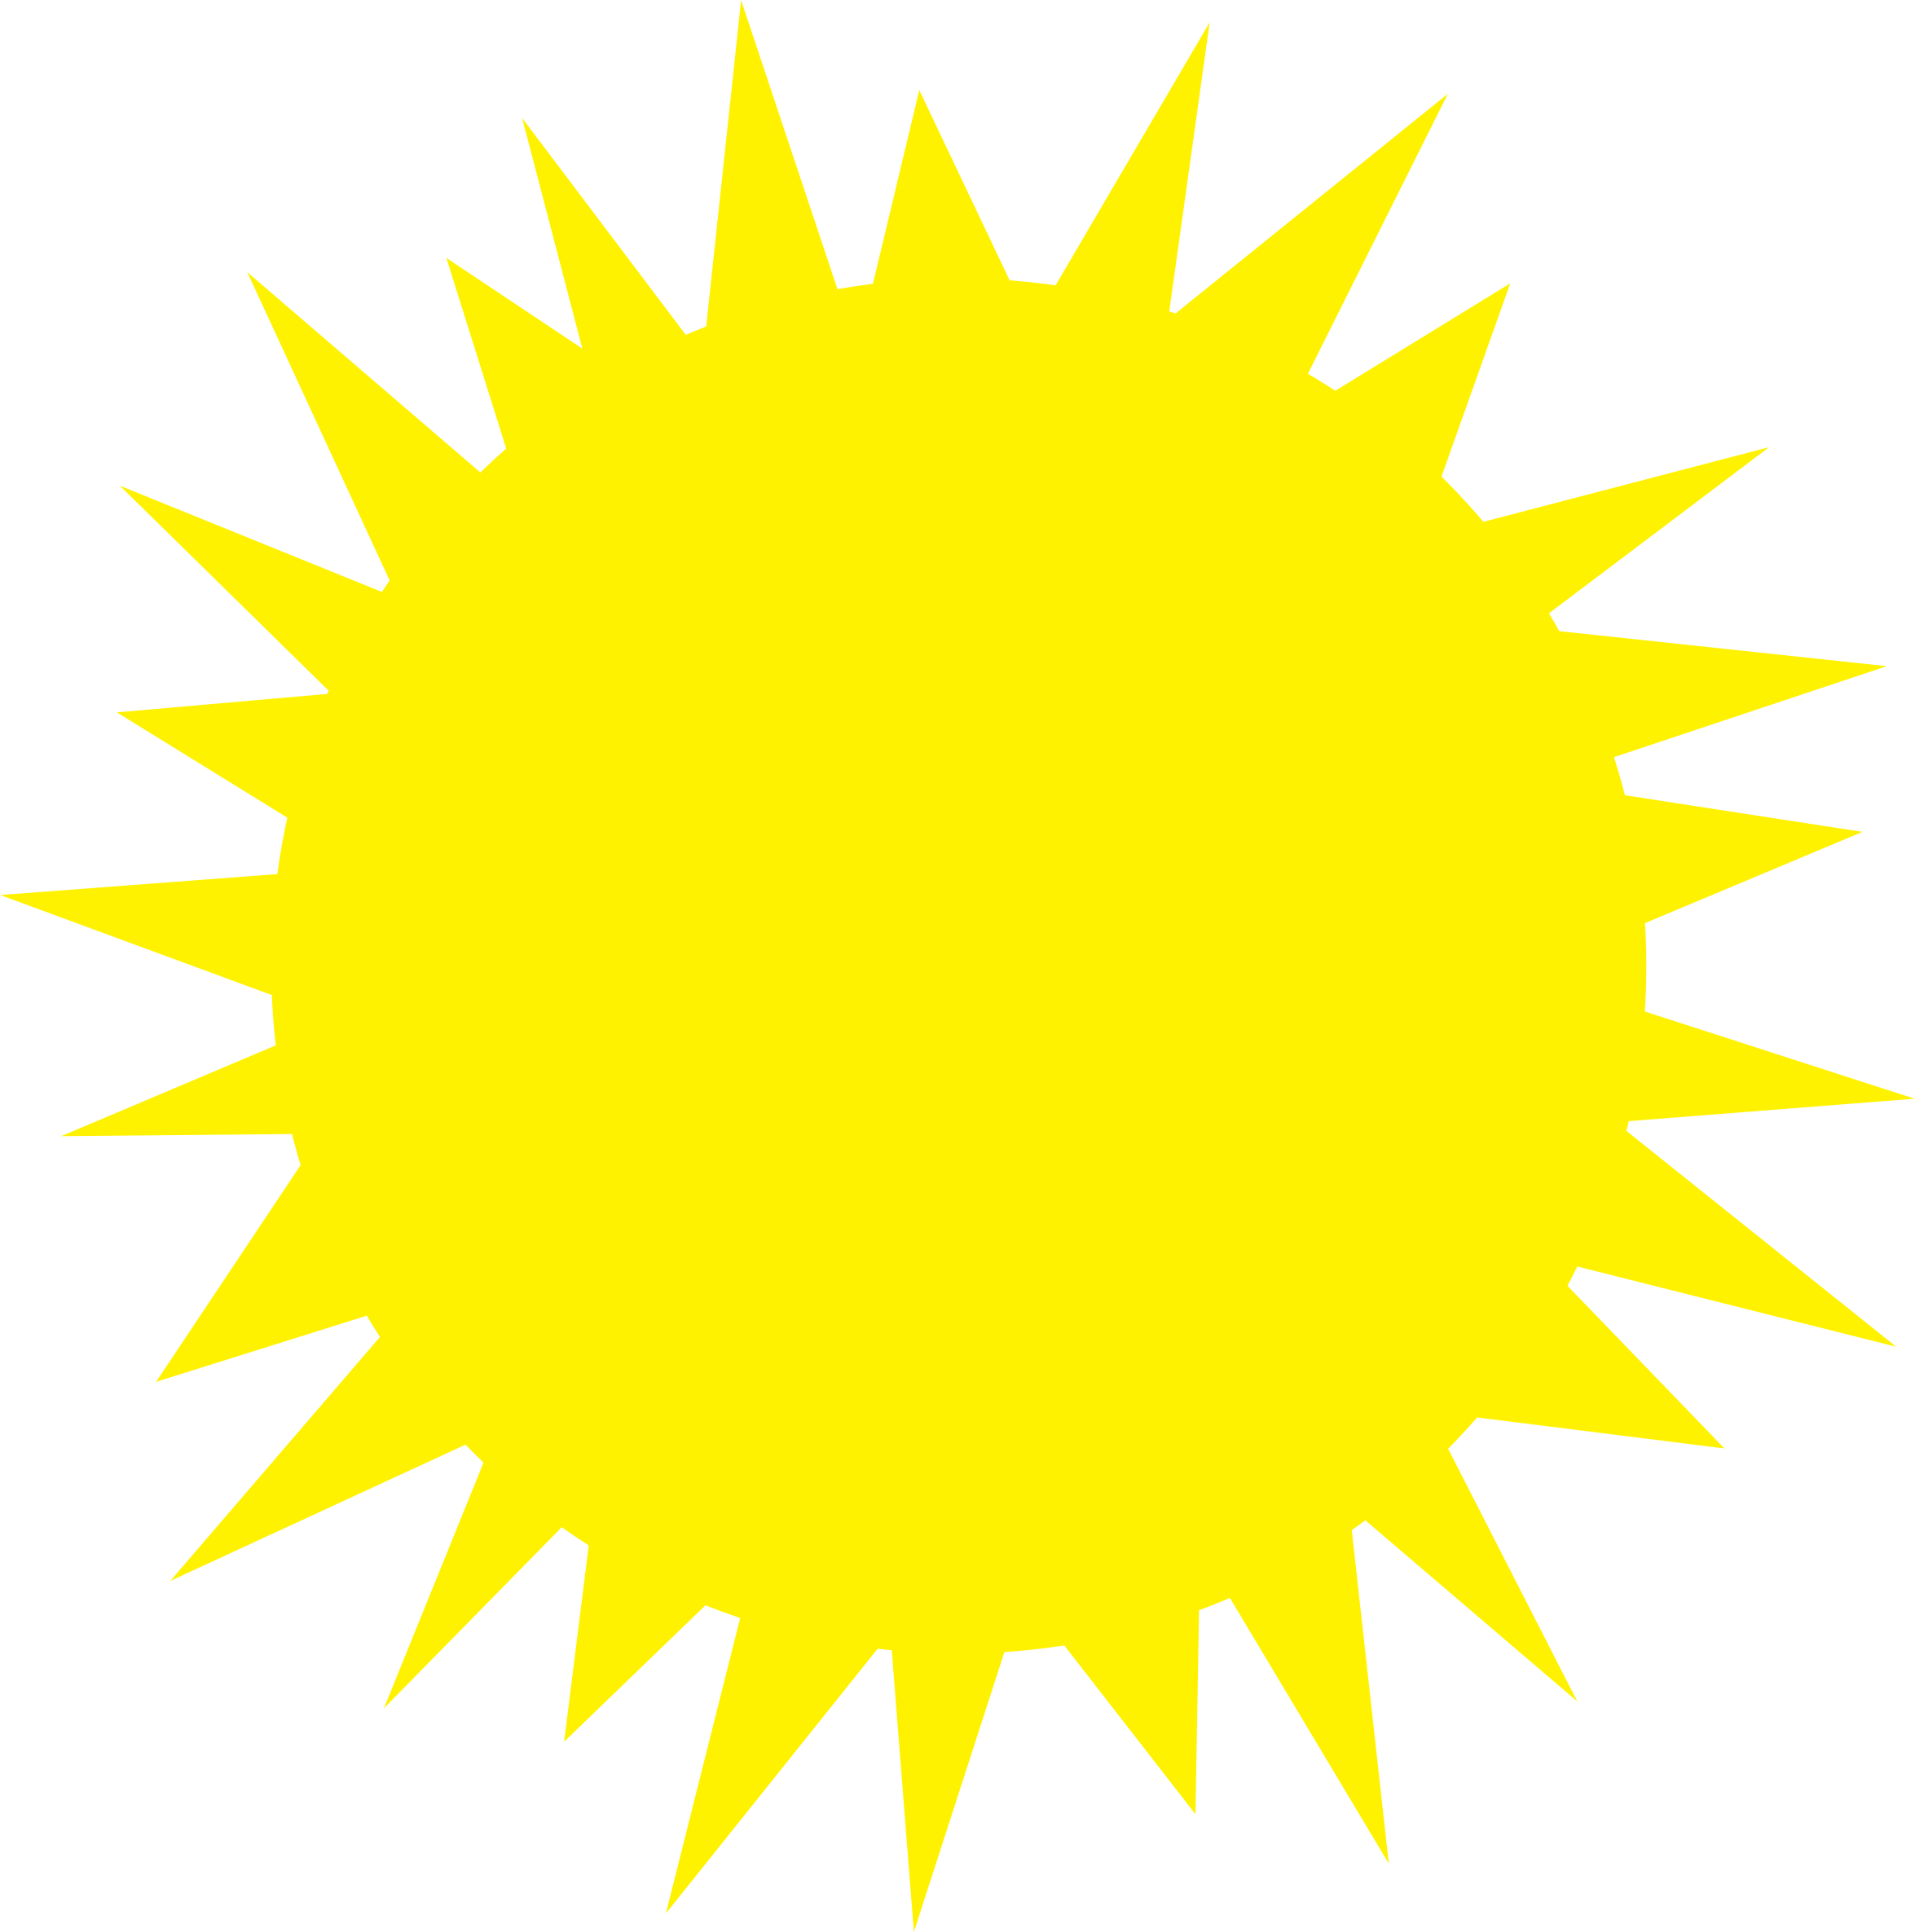 Sun clipart simple graphic free Clipart - Plain Simple Sun graphic free